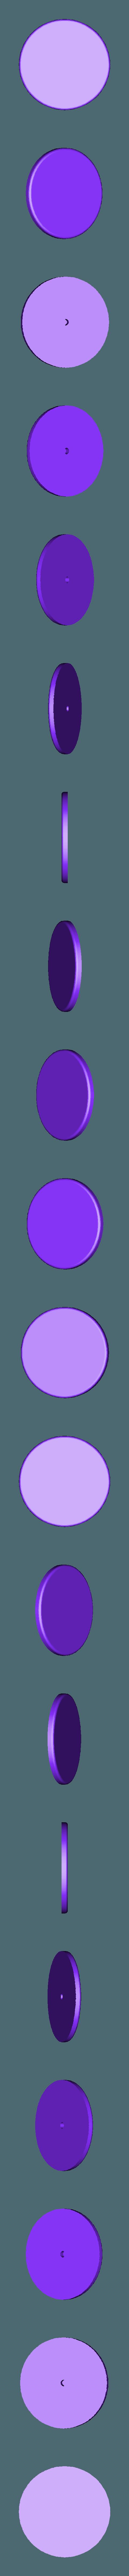 Plate.stl Download free STL file TurnTable • 3D printable template, Digitang3D